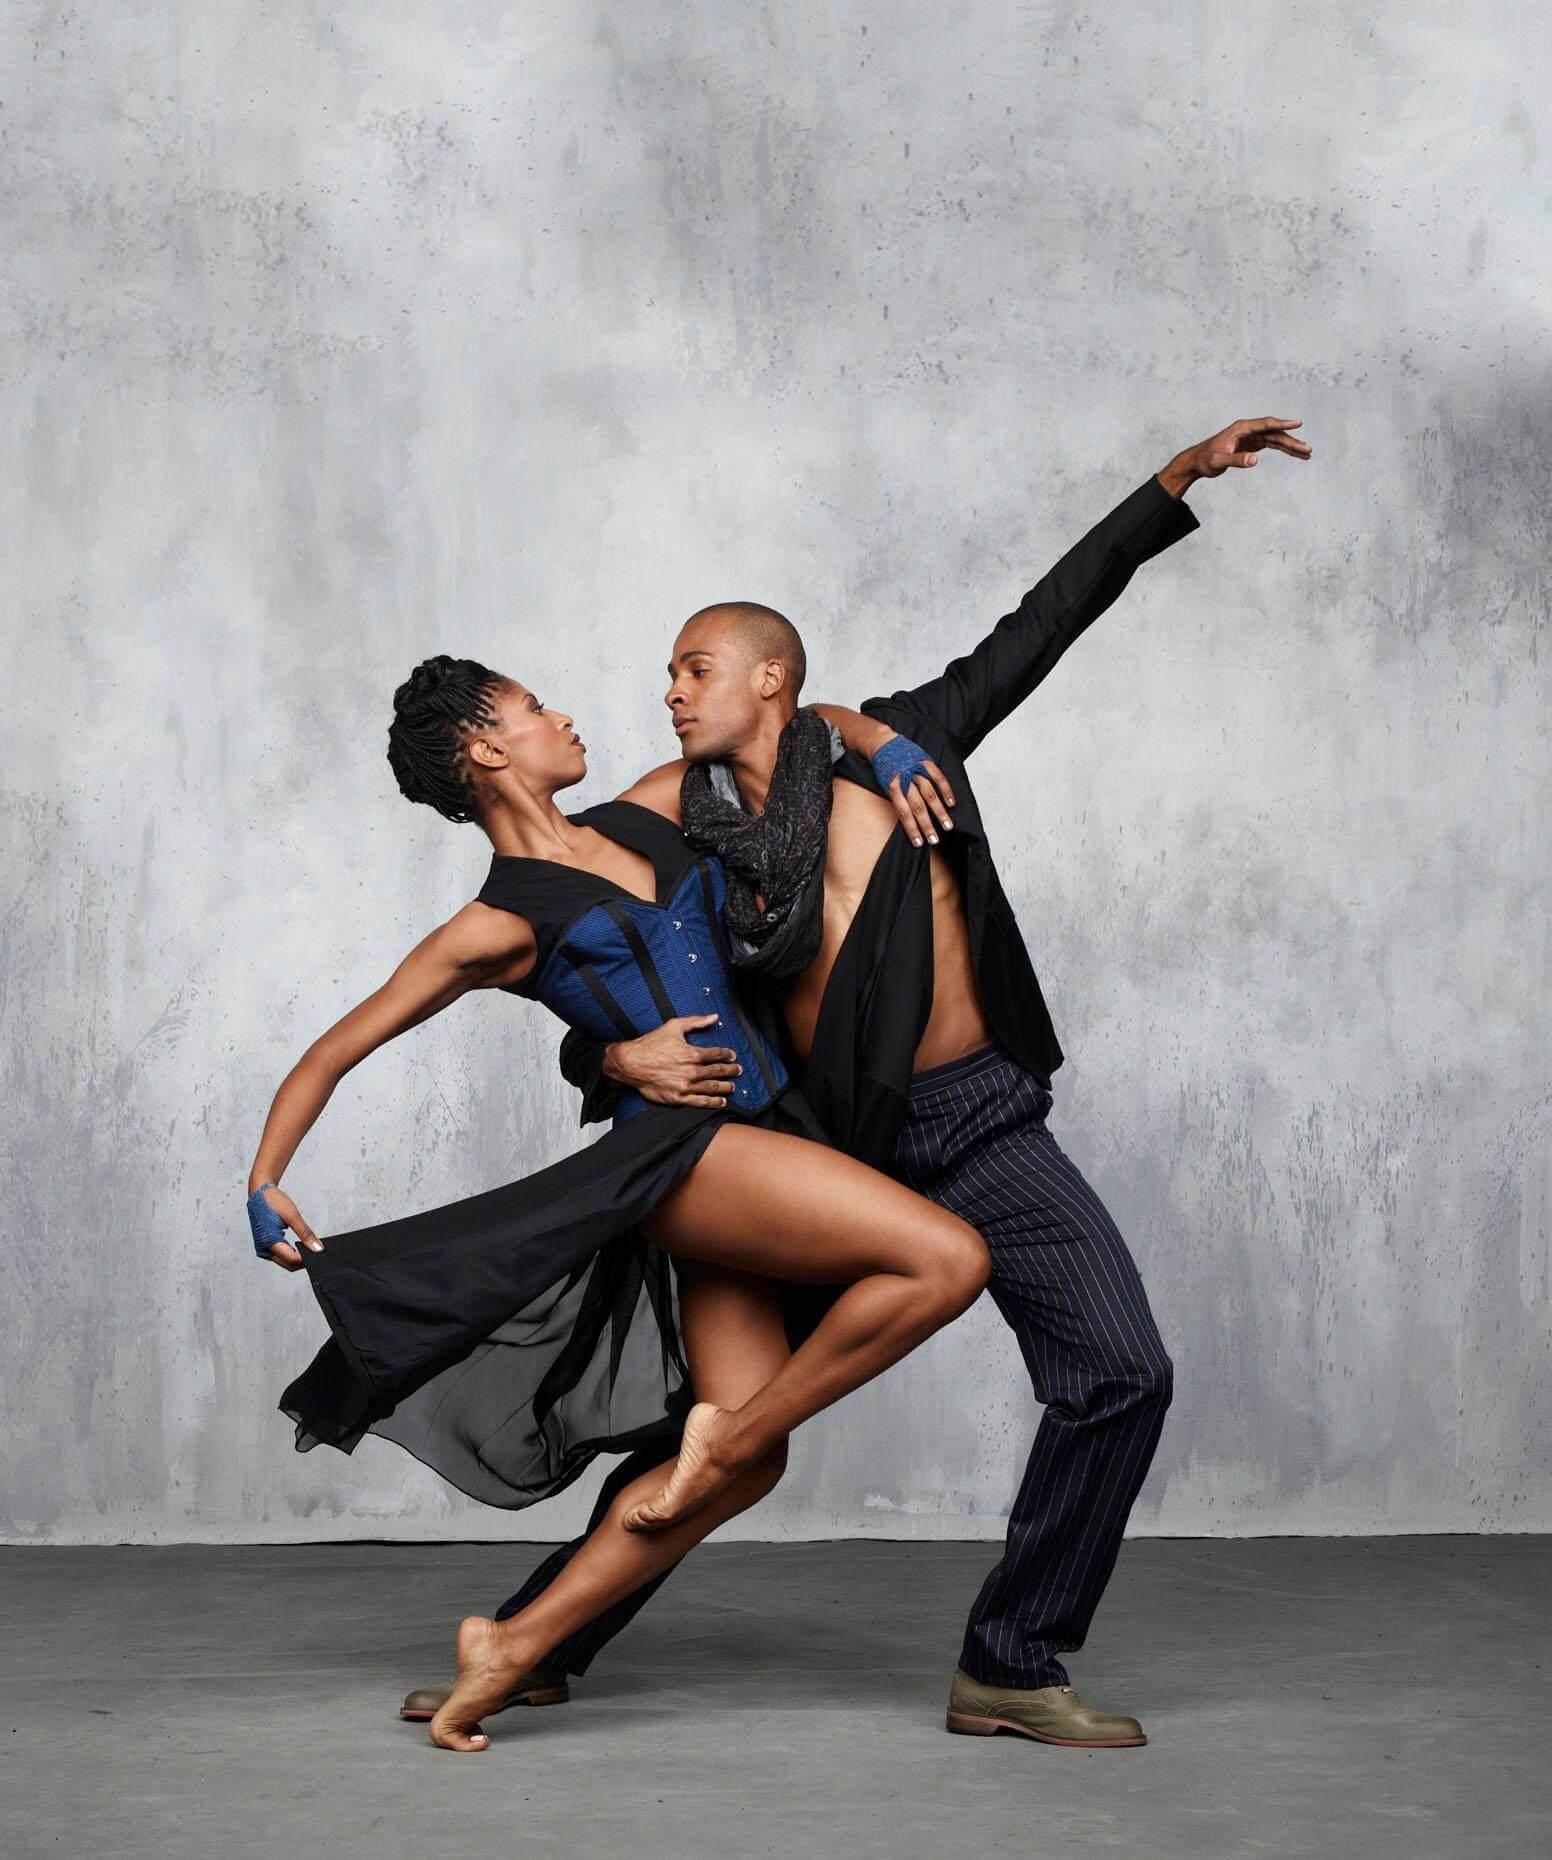 Танцы — хобби для активных людей